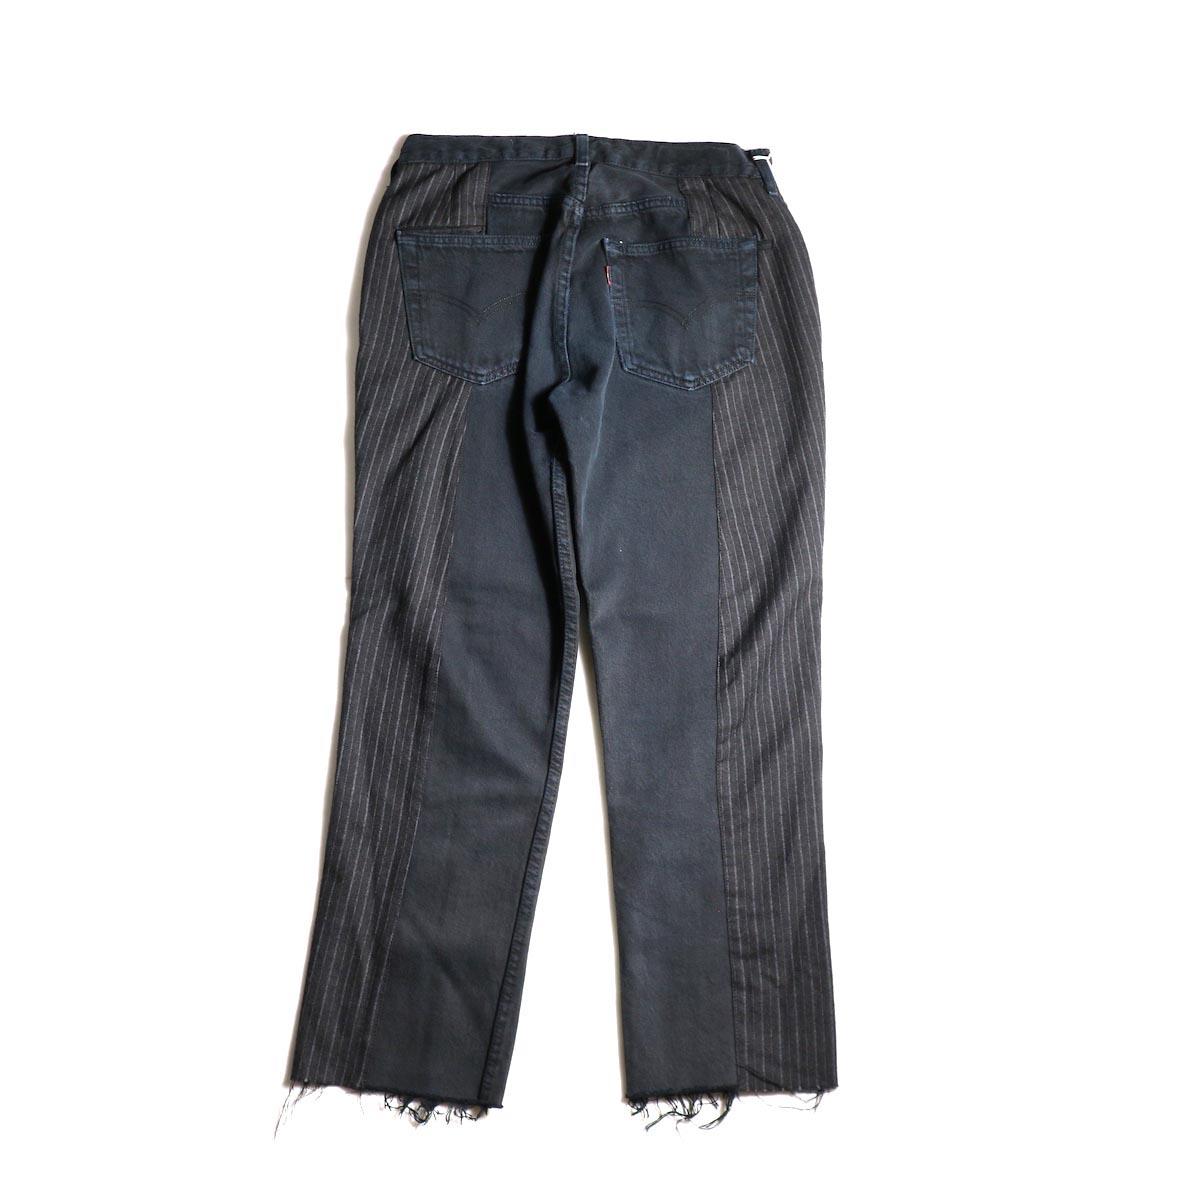 OLD PARK / Docking Jeans Black (Ssize-A)背面